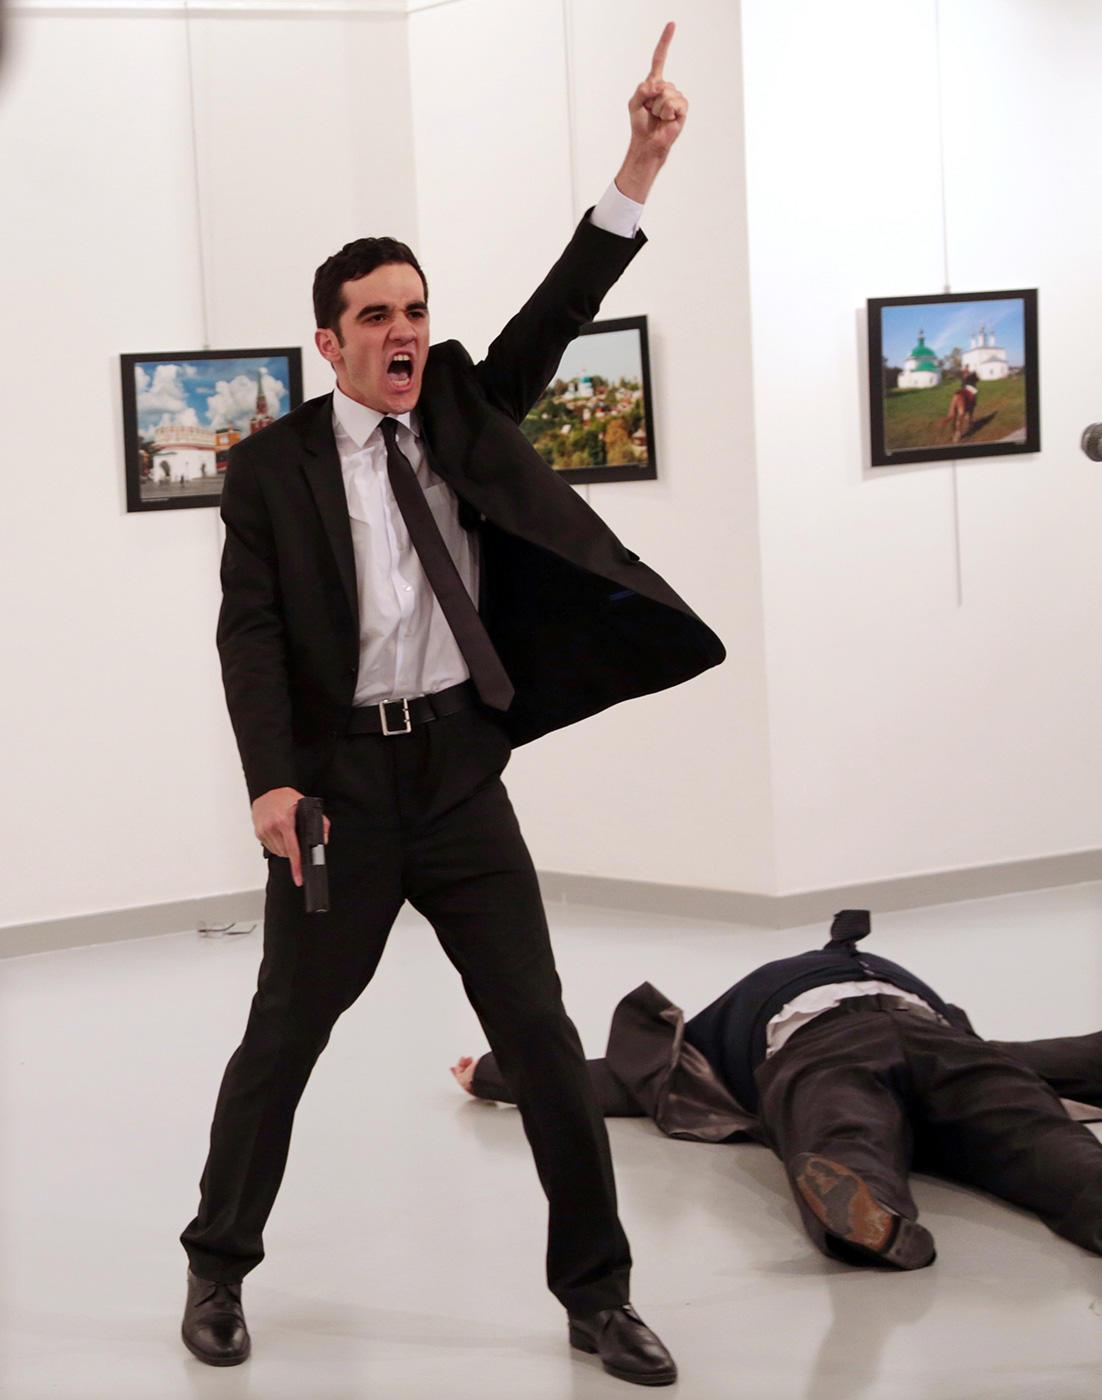 Лучшее фото года по версии World Press Photo. Фото: meduza.io